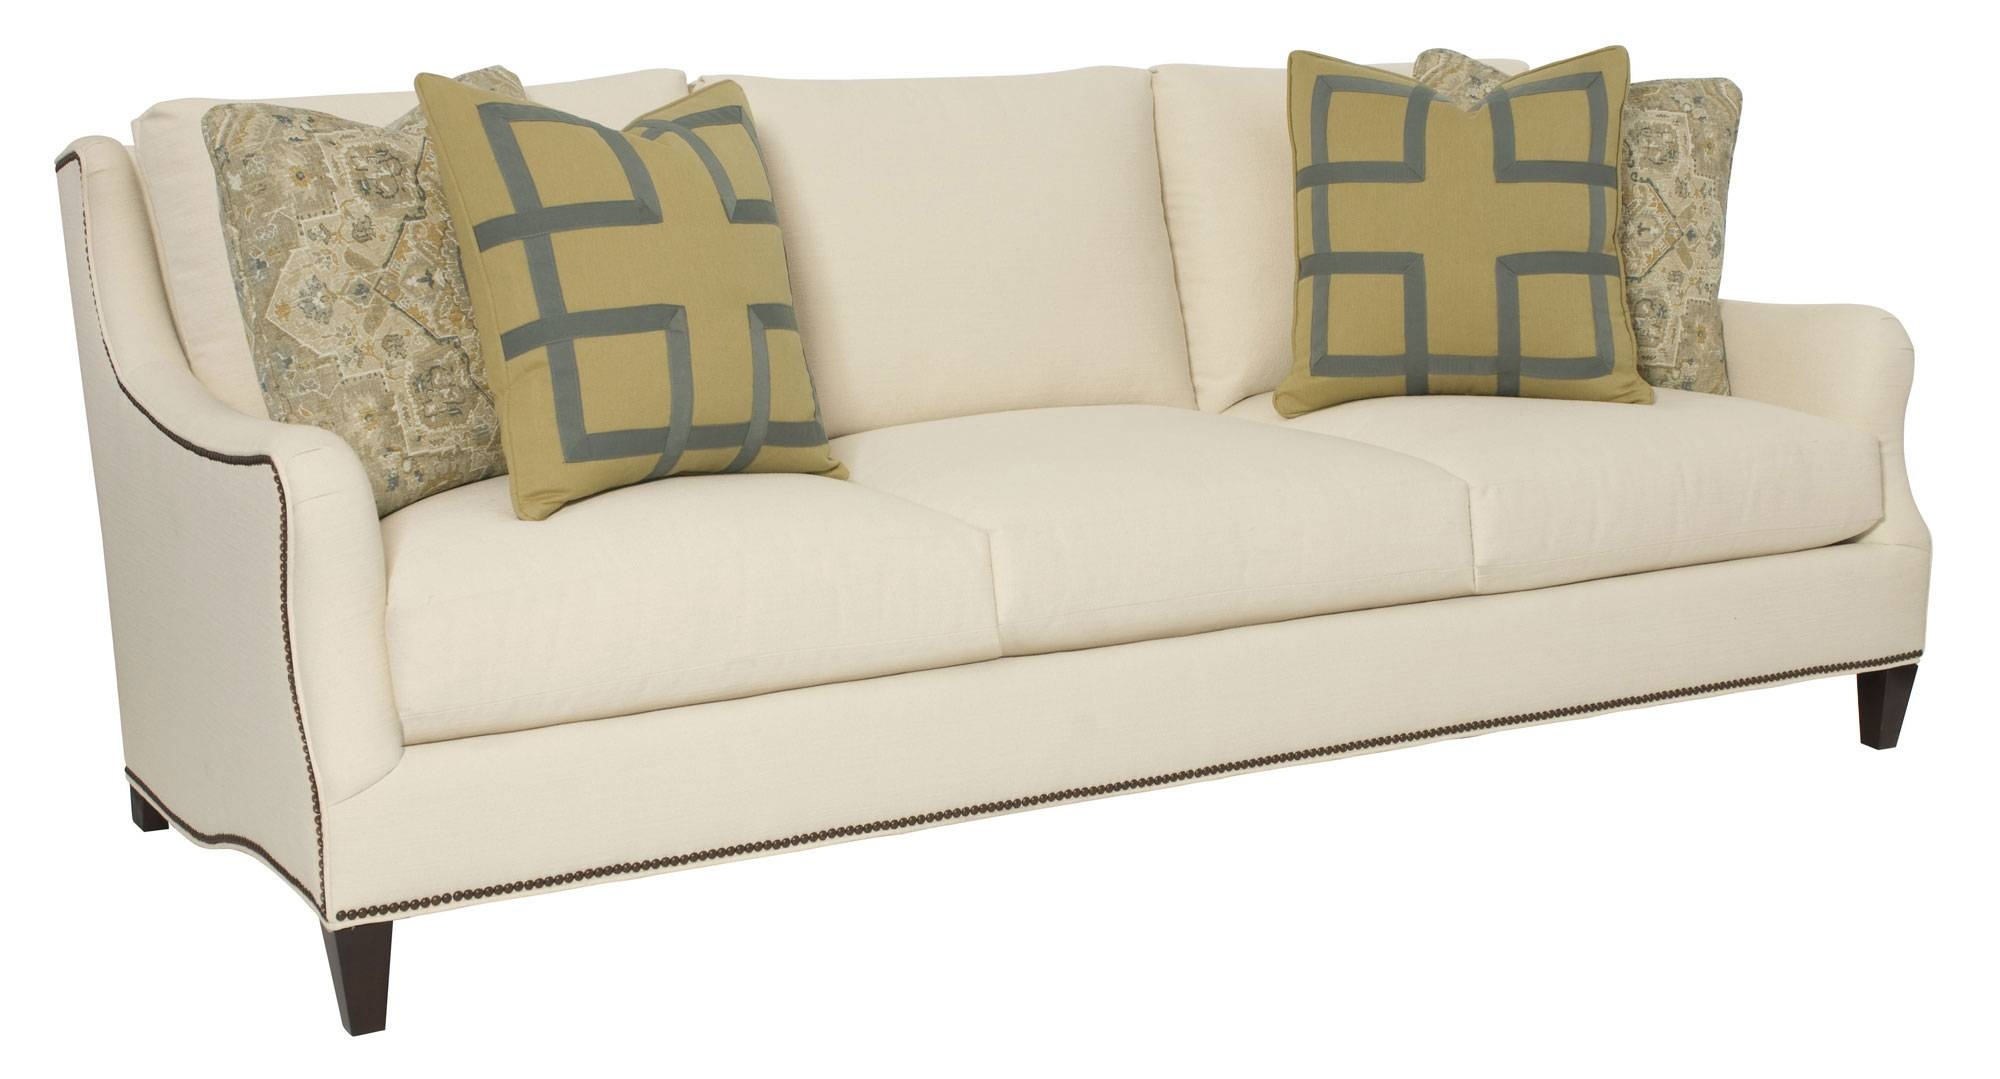 Hamilton Sofa regarding Hamilton Sofas (Image 6 of 15)